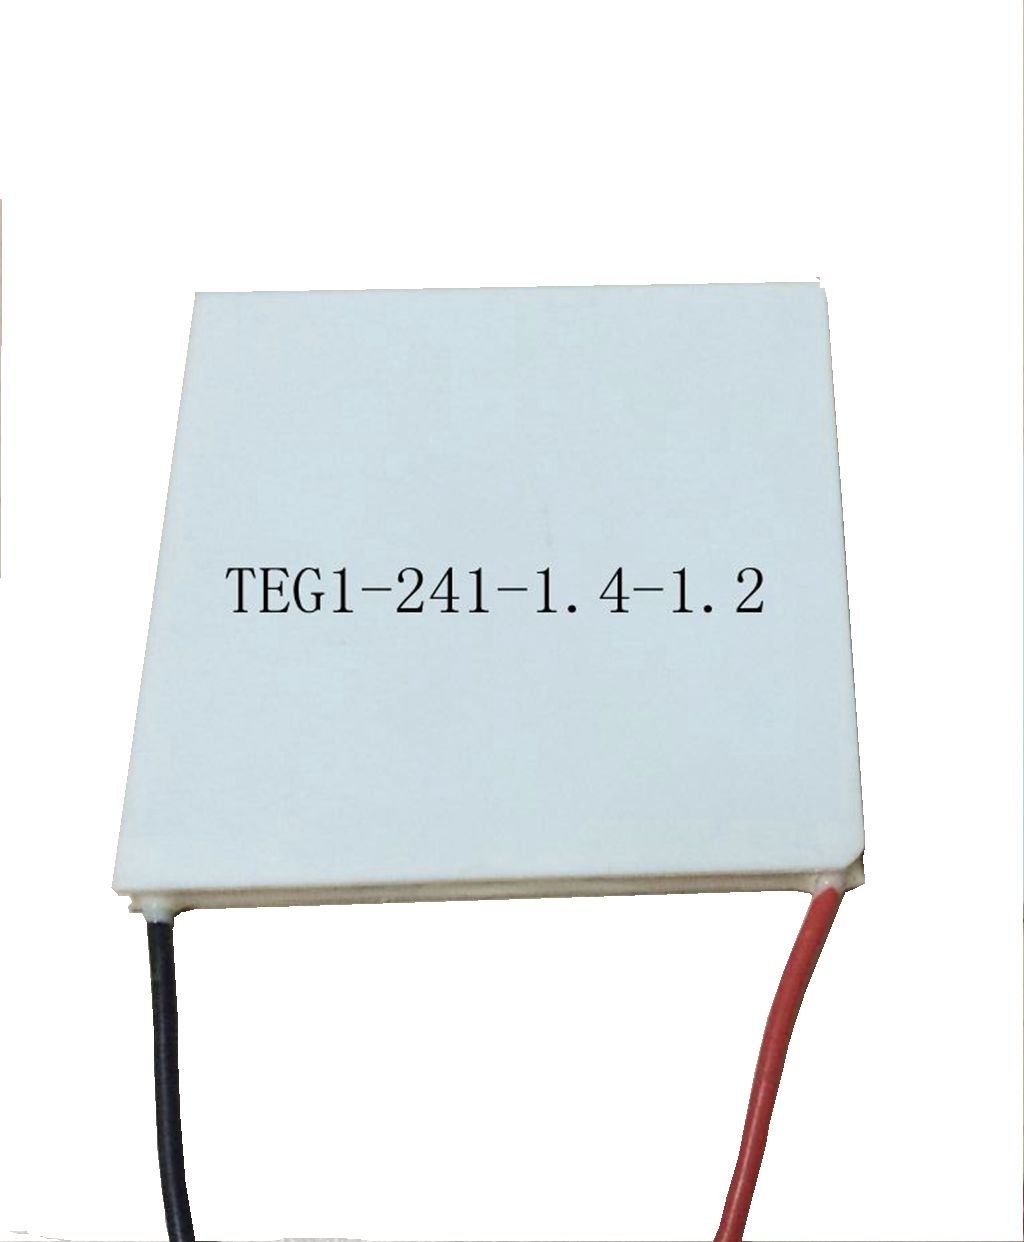 BXQINLENX 55x55MM 7V 1.25A TEG1-241-1.4-1.2 Thermoelectric Power Generation Peltier Module